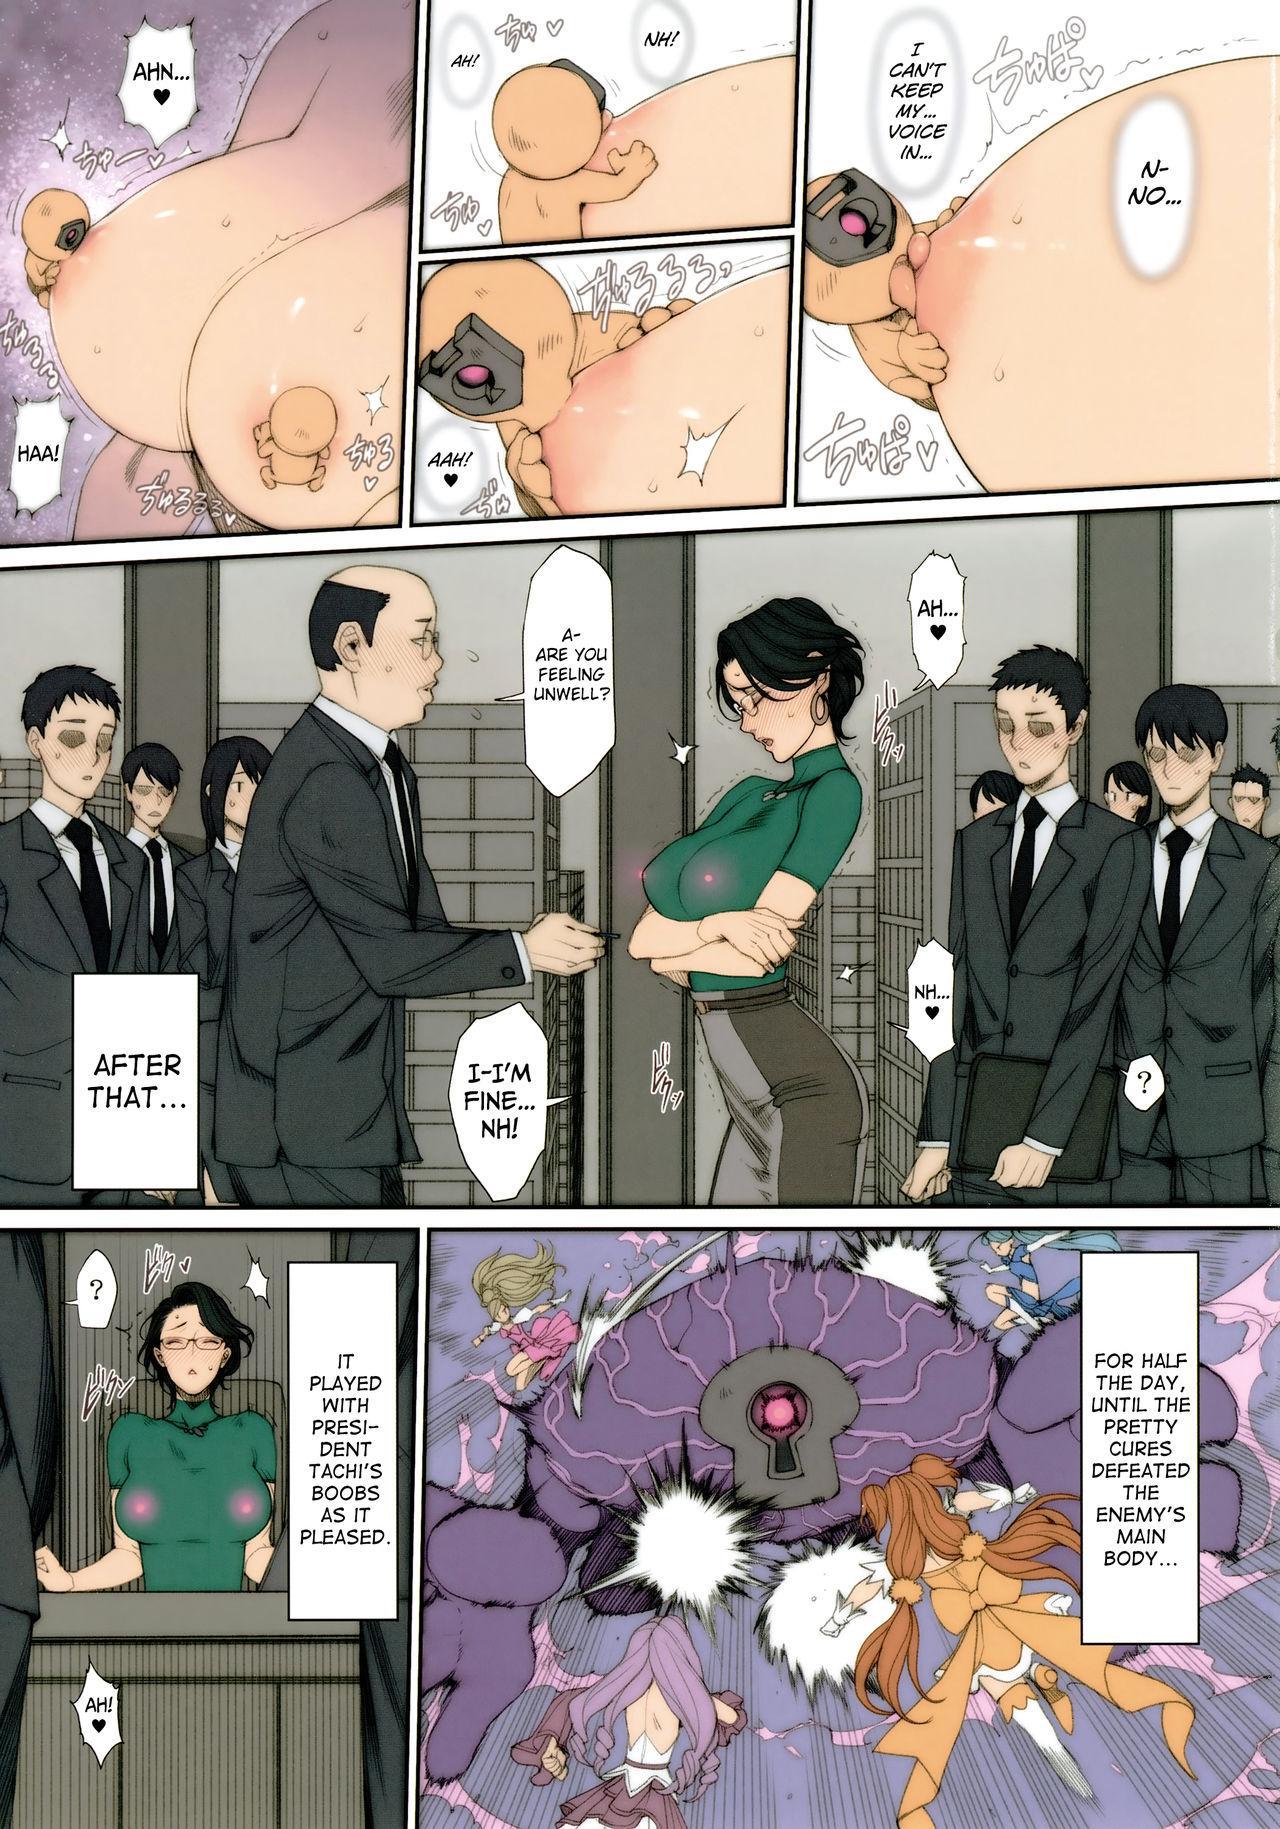 H na Toshiue Chara no Rakugaki - Rough Manga Hon | A Collection of Sketches and Rough Manga of Hot MILFs 27